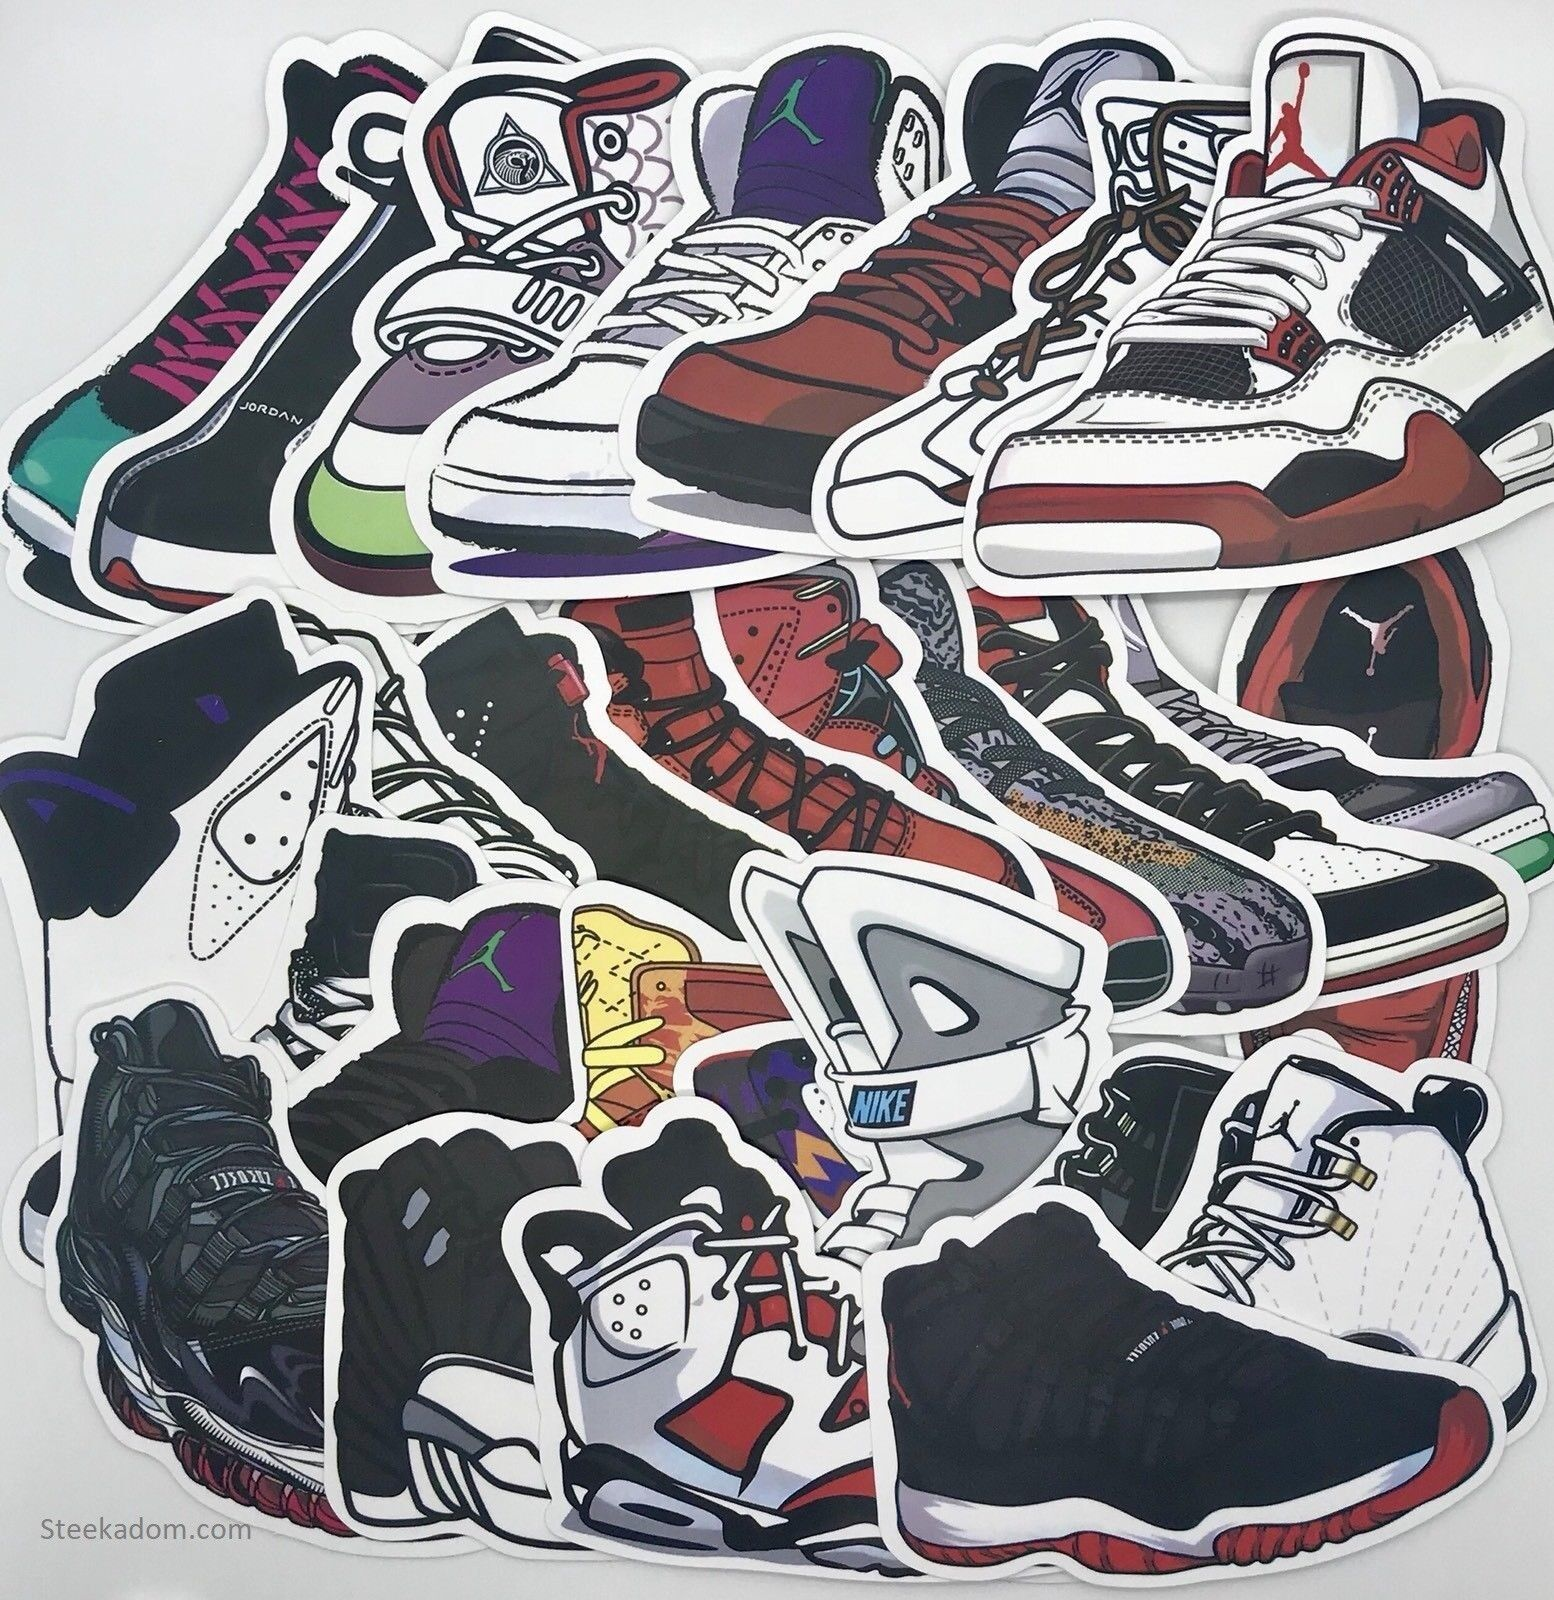 Jordan stickers retro shoes nike air max yeezy mag custom animated style